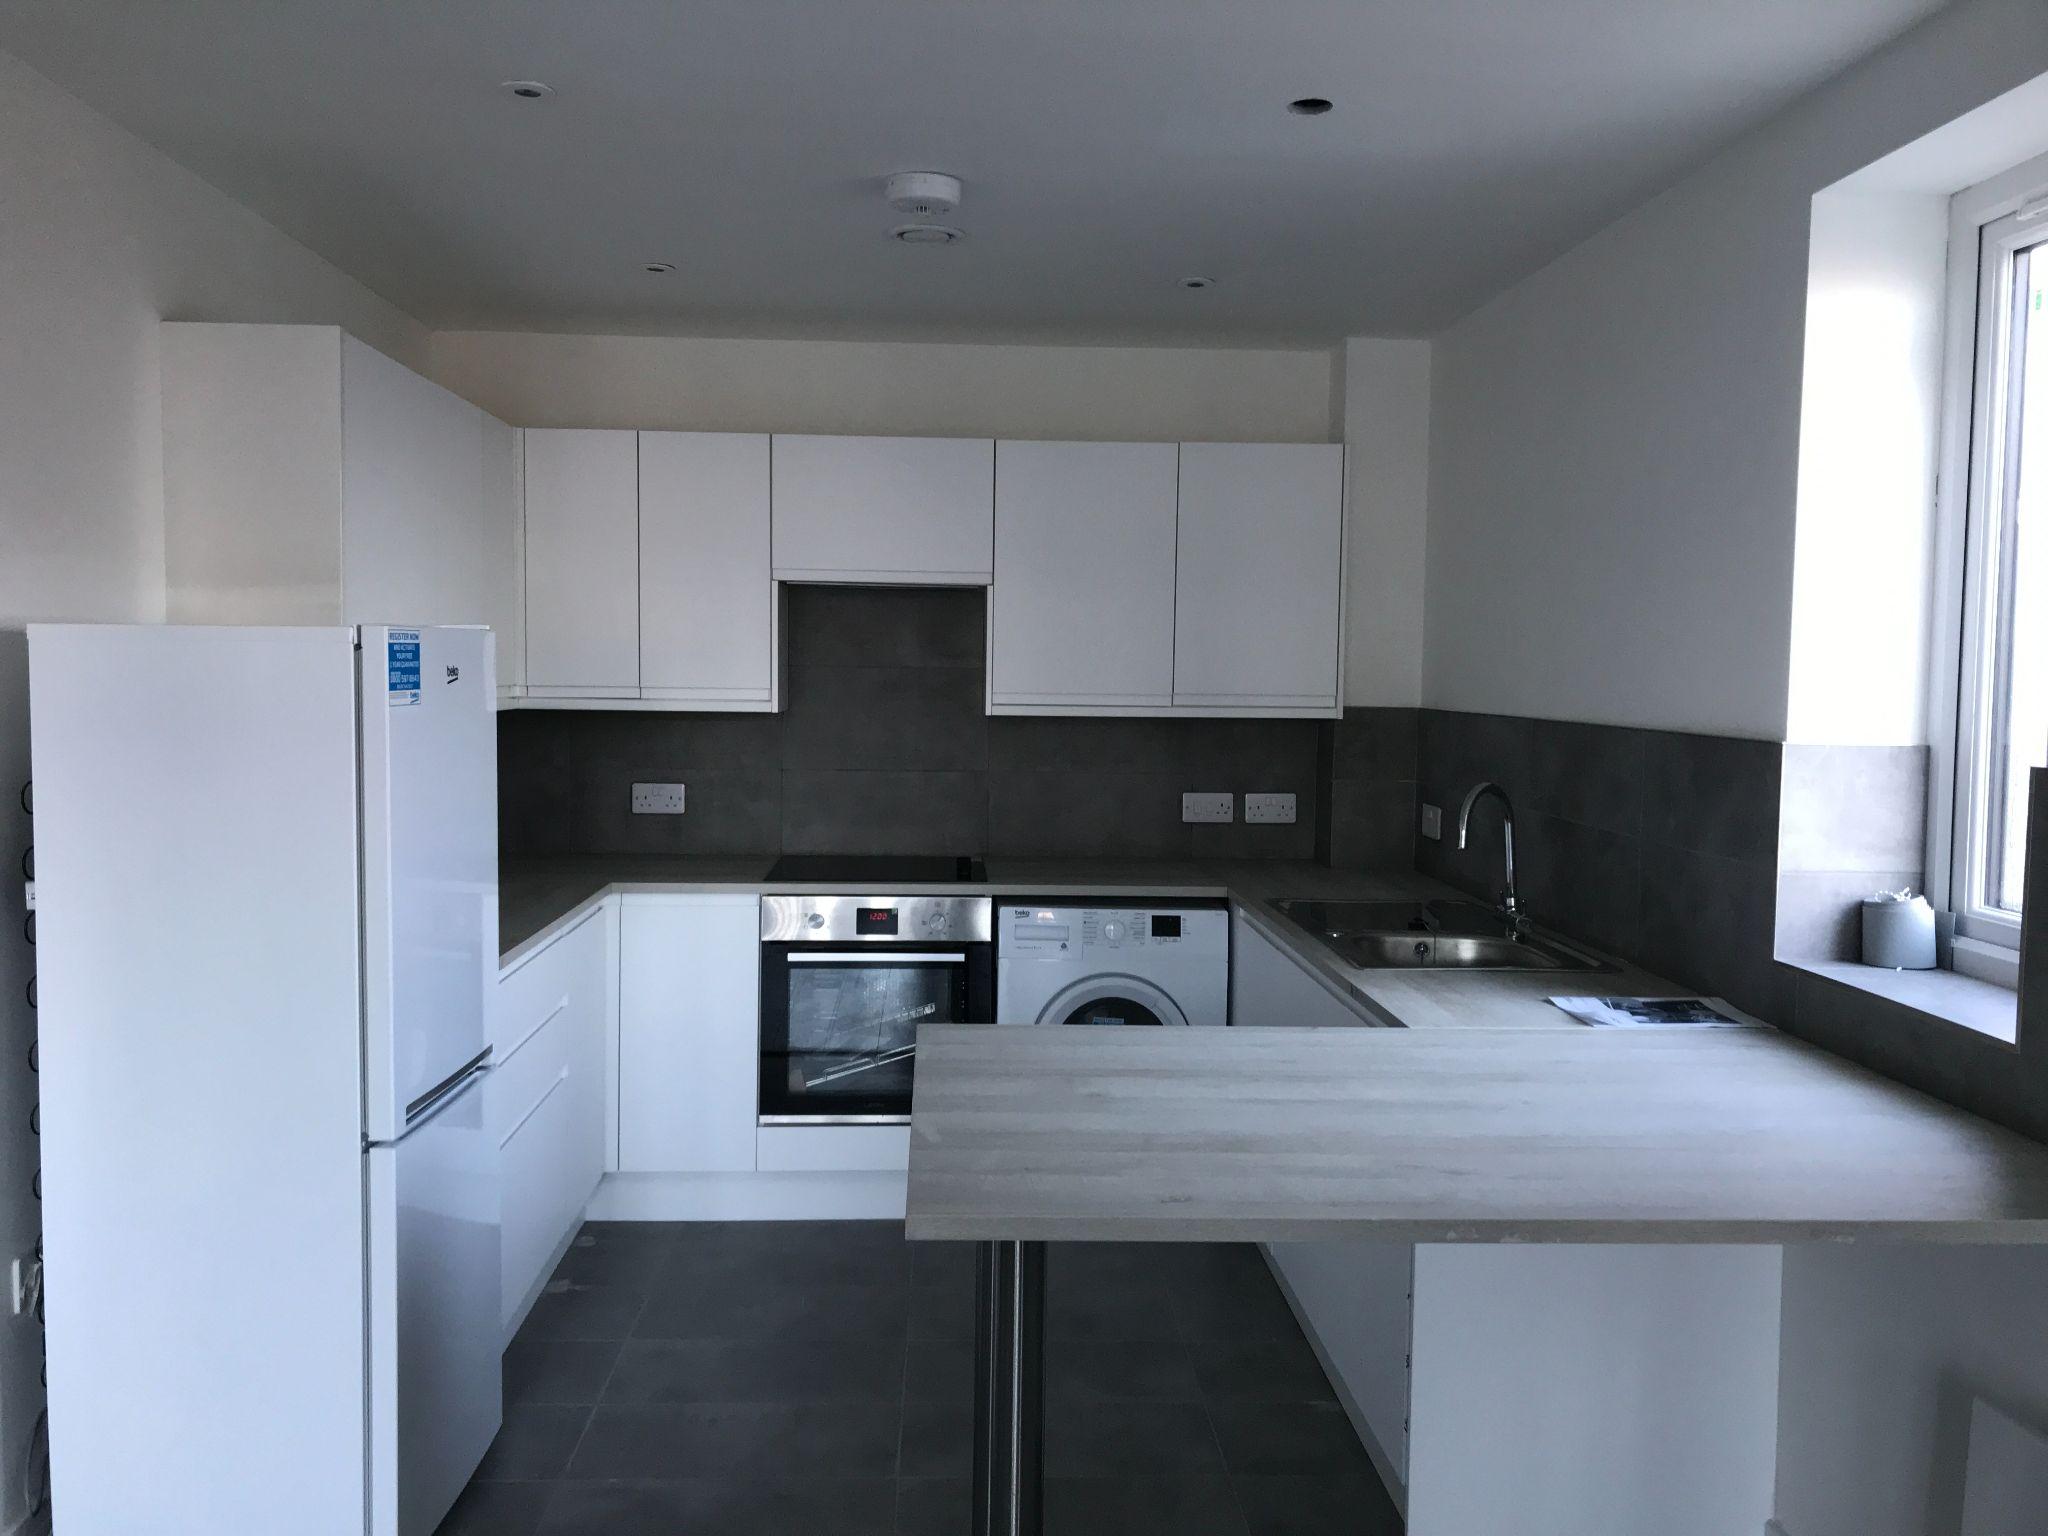 1 Bedroom Apartment Flat/apartment - Photograph 4